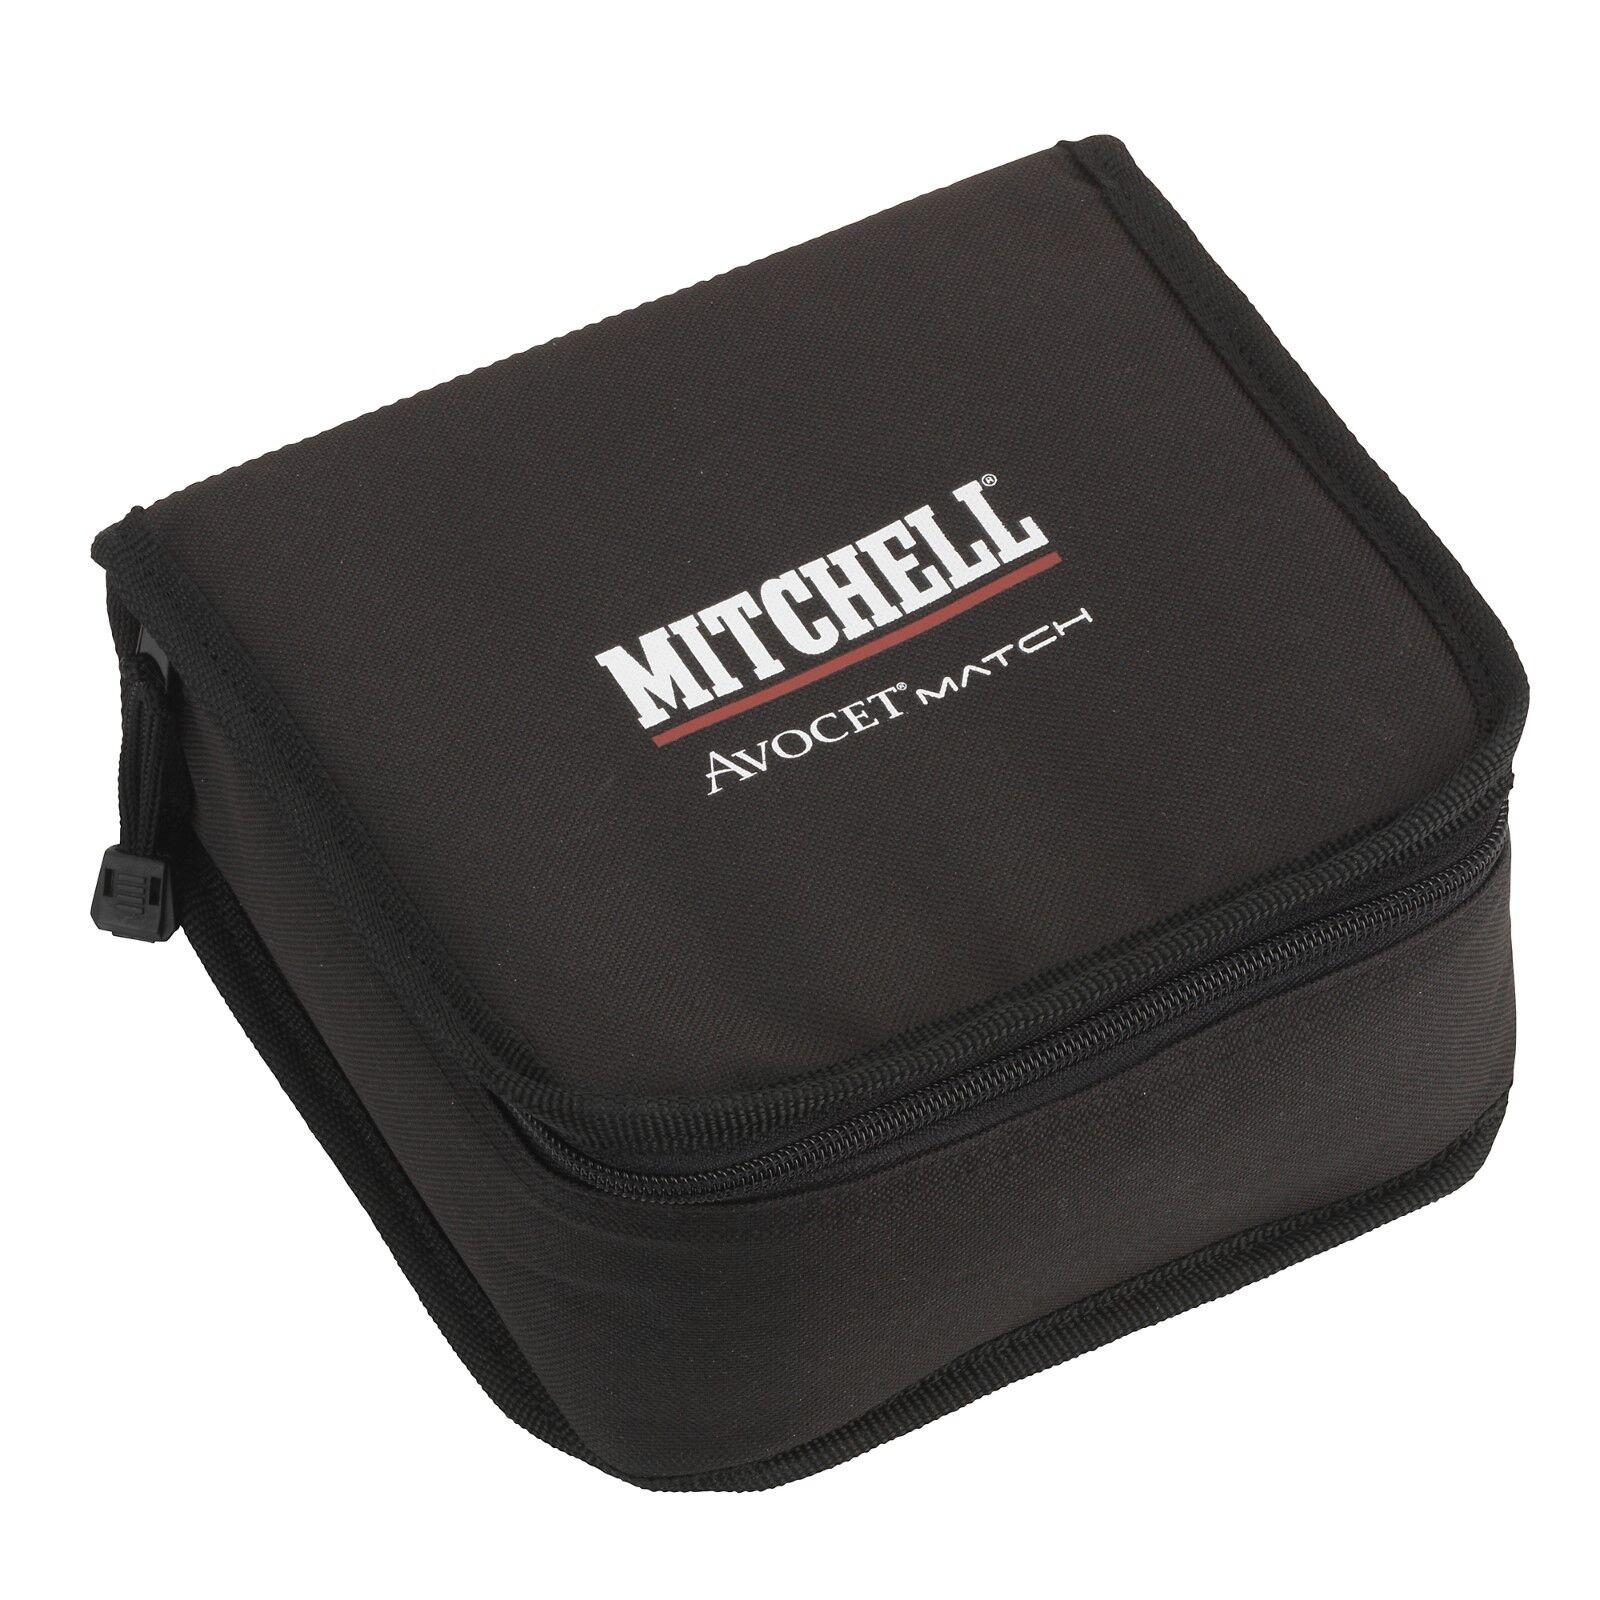 Mitchell nuevo avoceta match match match RZ 4000 FD-Con Estuche - 1446176 8a3868